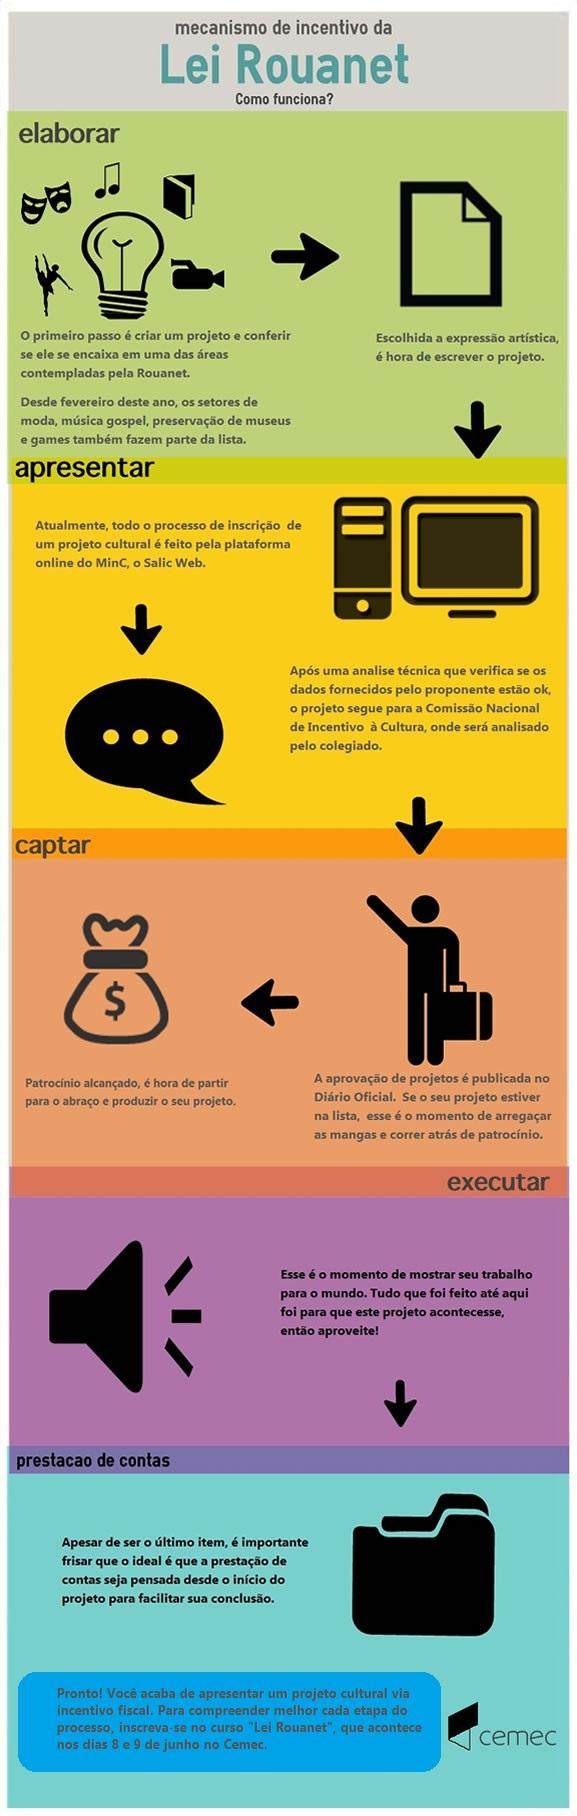 Lei Rouanet - infográfico